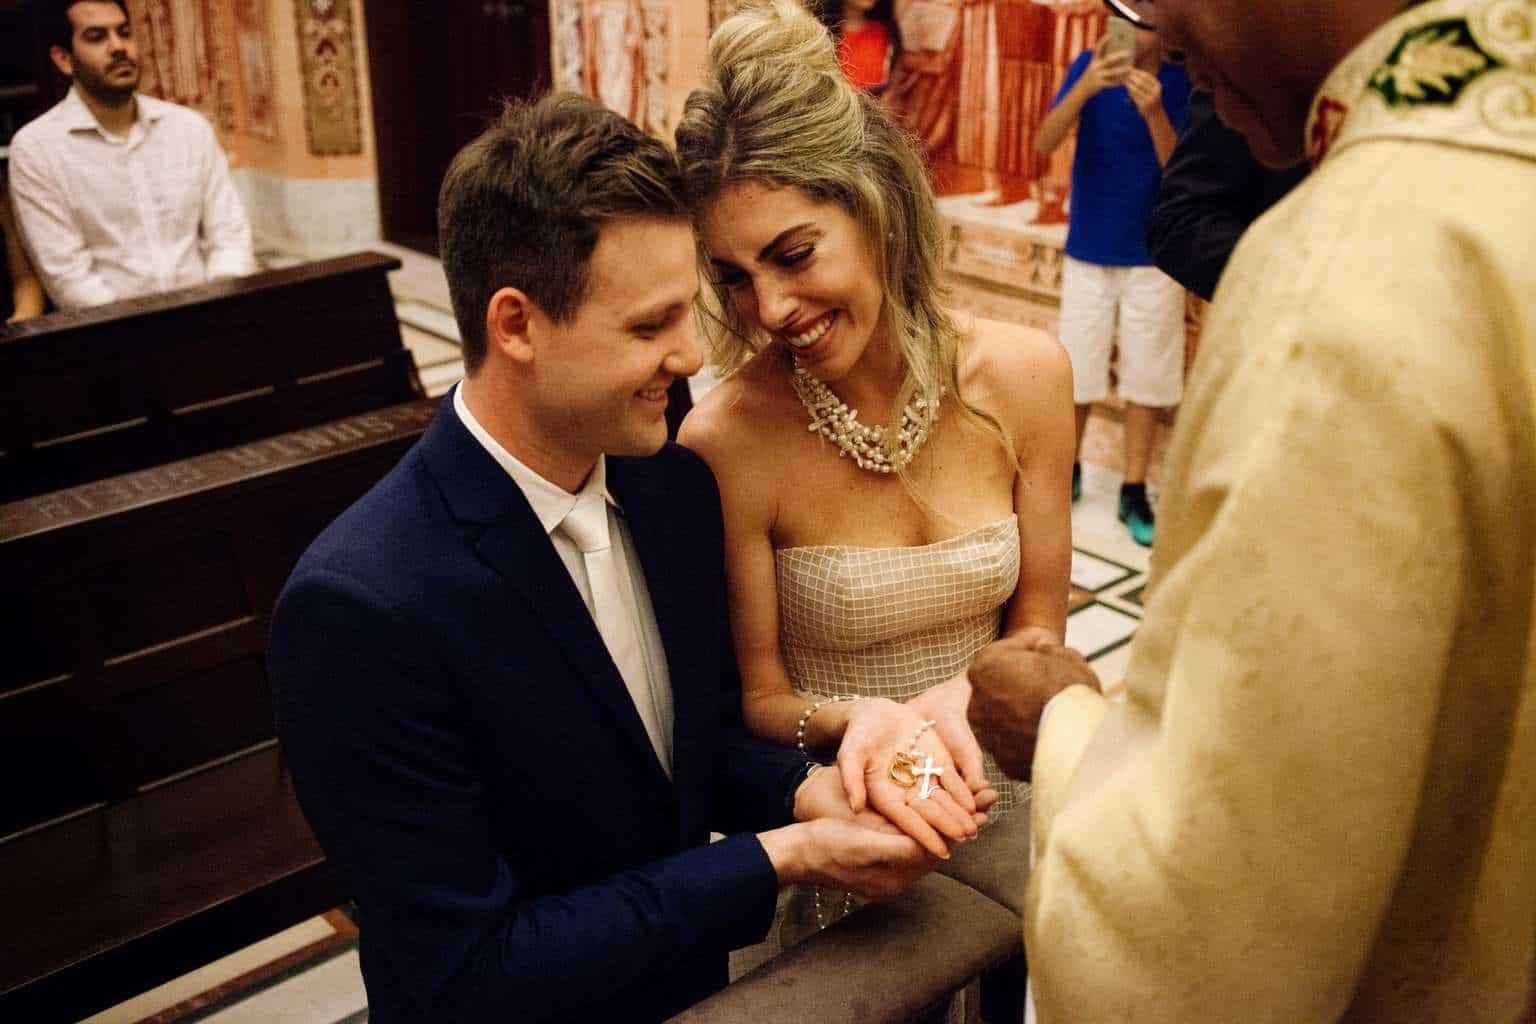 casamento-casamento-de-dia-cerimonia-Cissa-Sannomiya-Clube-Hipico-de-Santo-Amaro-igreja-marina-e-josé-Miguel-Kanashiro-casamento-4